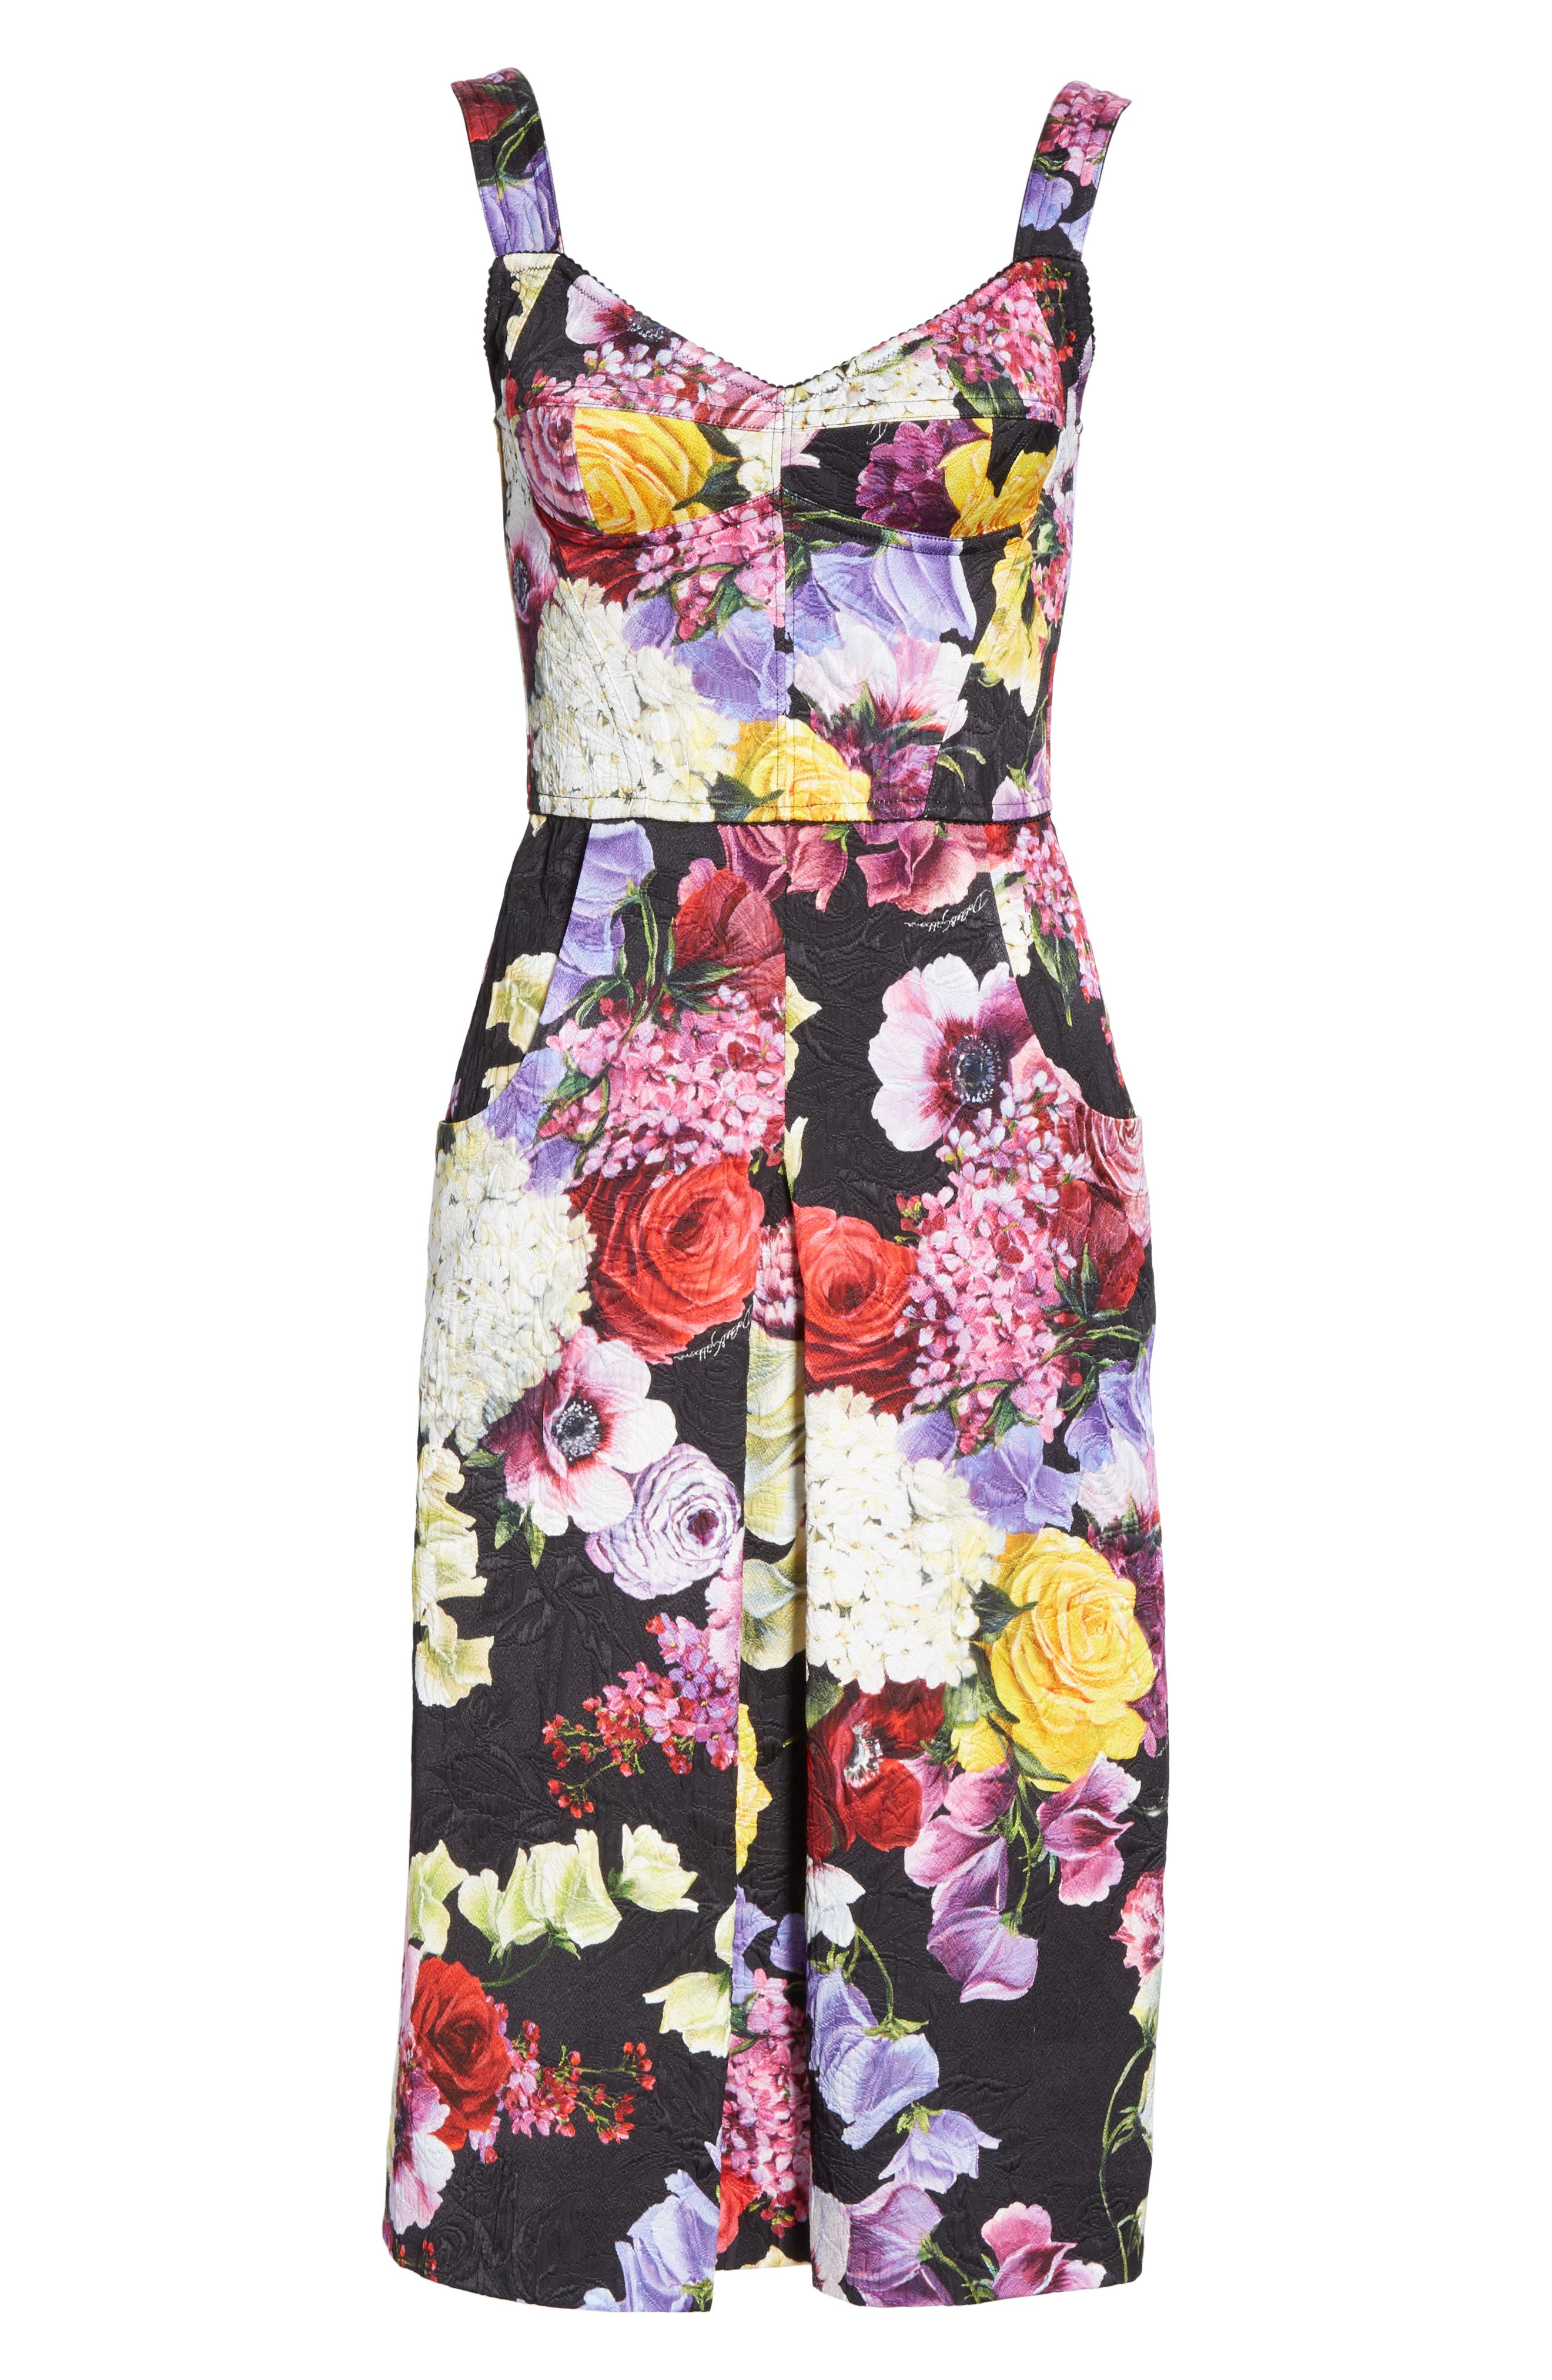 Floral Print Brocade Bustier Dress,                             Alternate thumbnail 6, color,                             HNW86 BLACK FLORAL